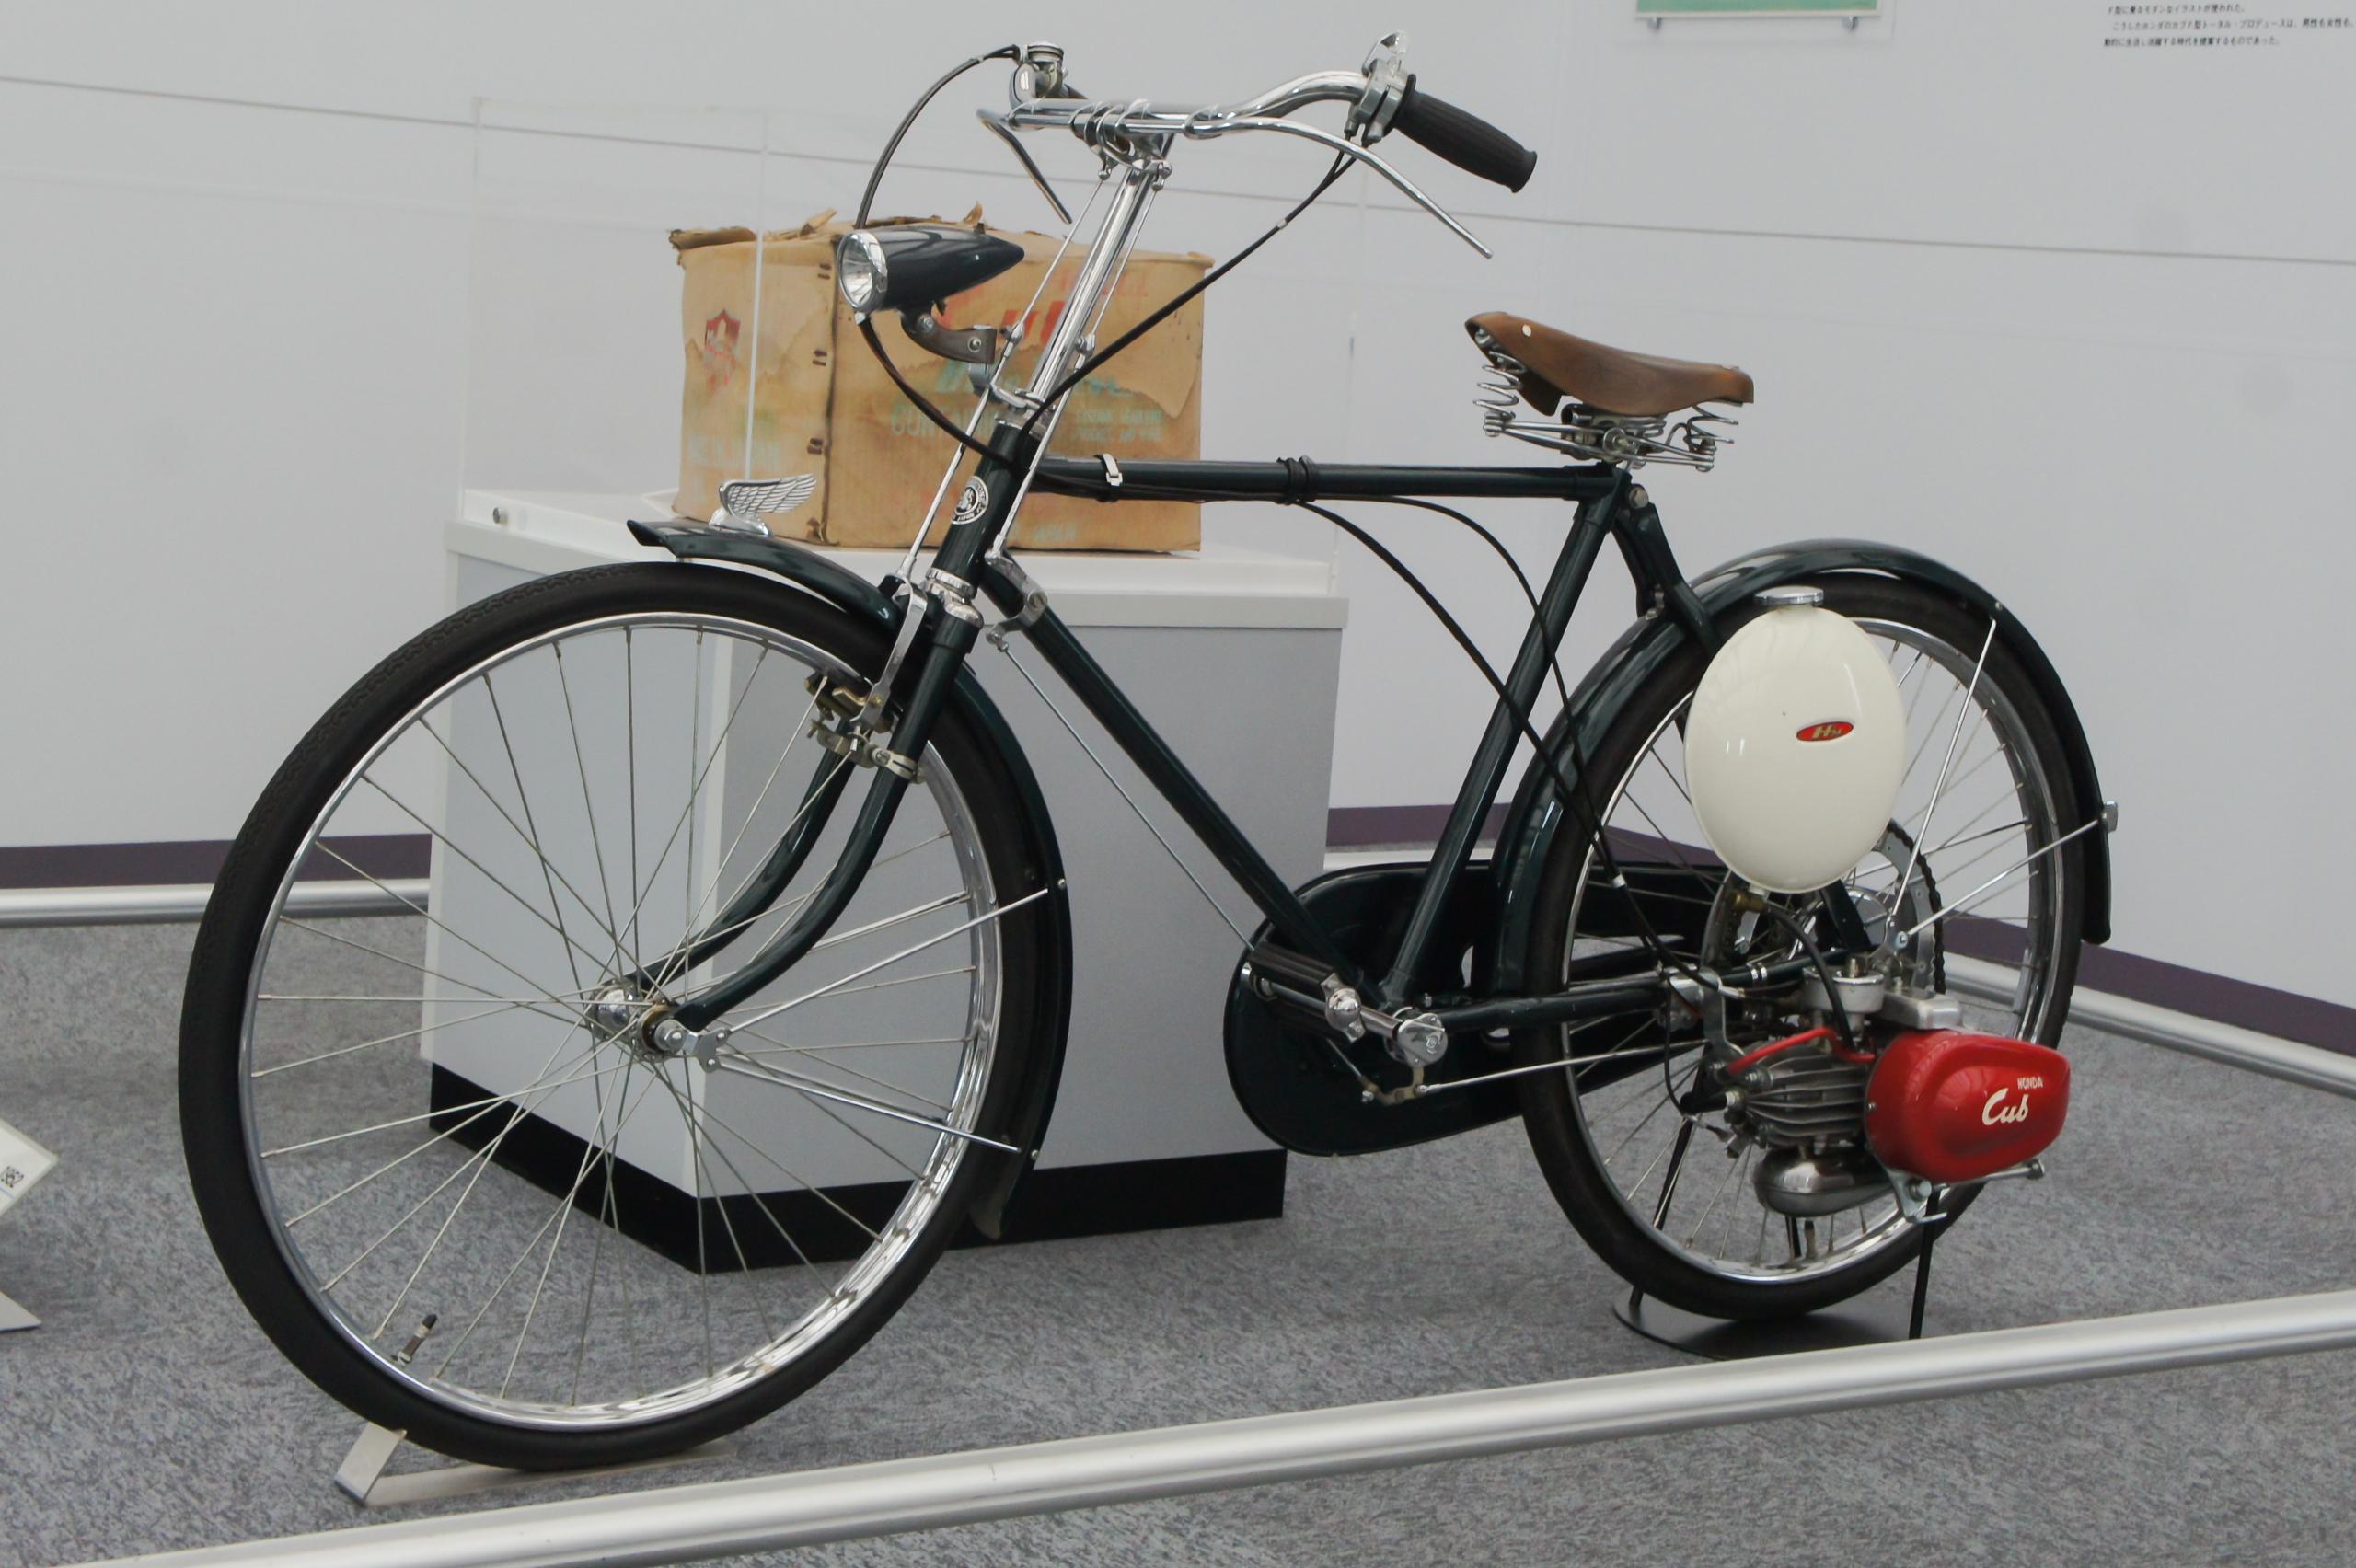 Honda_Cub_F_with_bicycle_Honda_Collectio